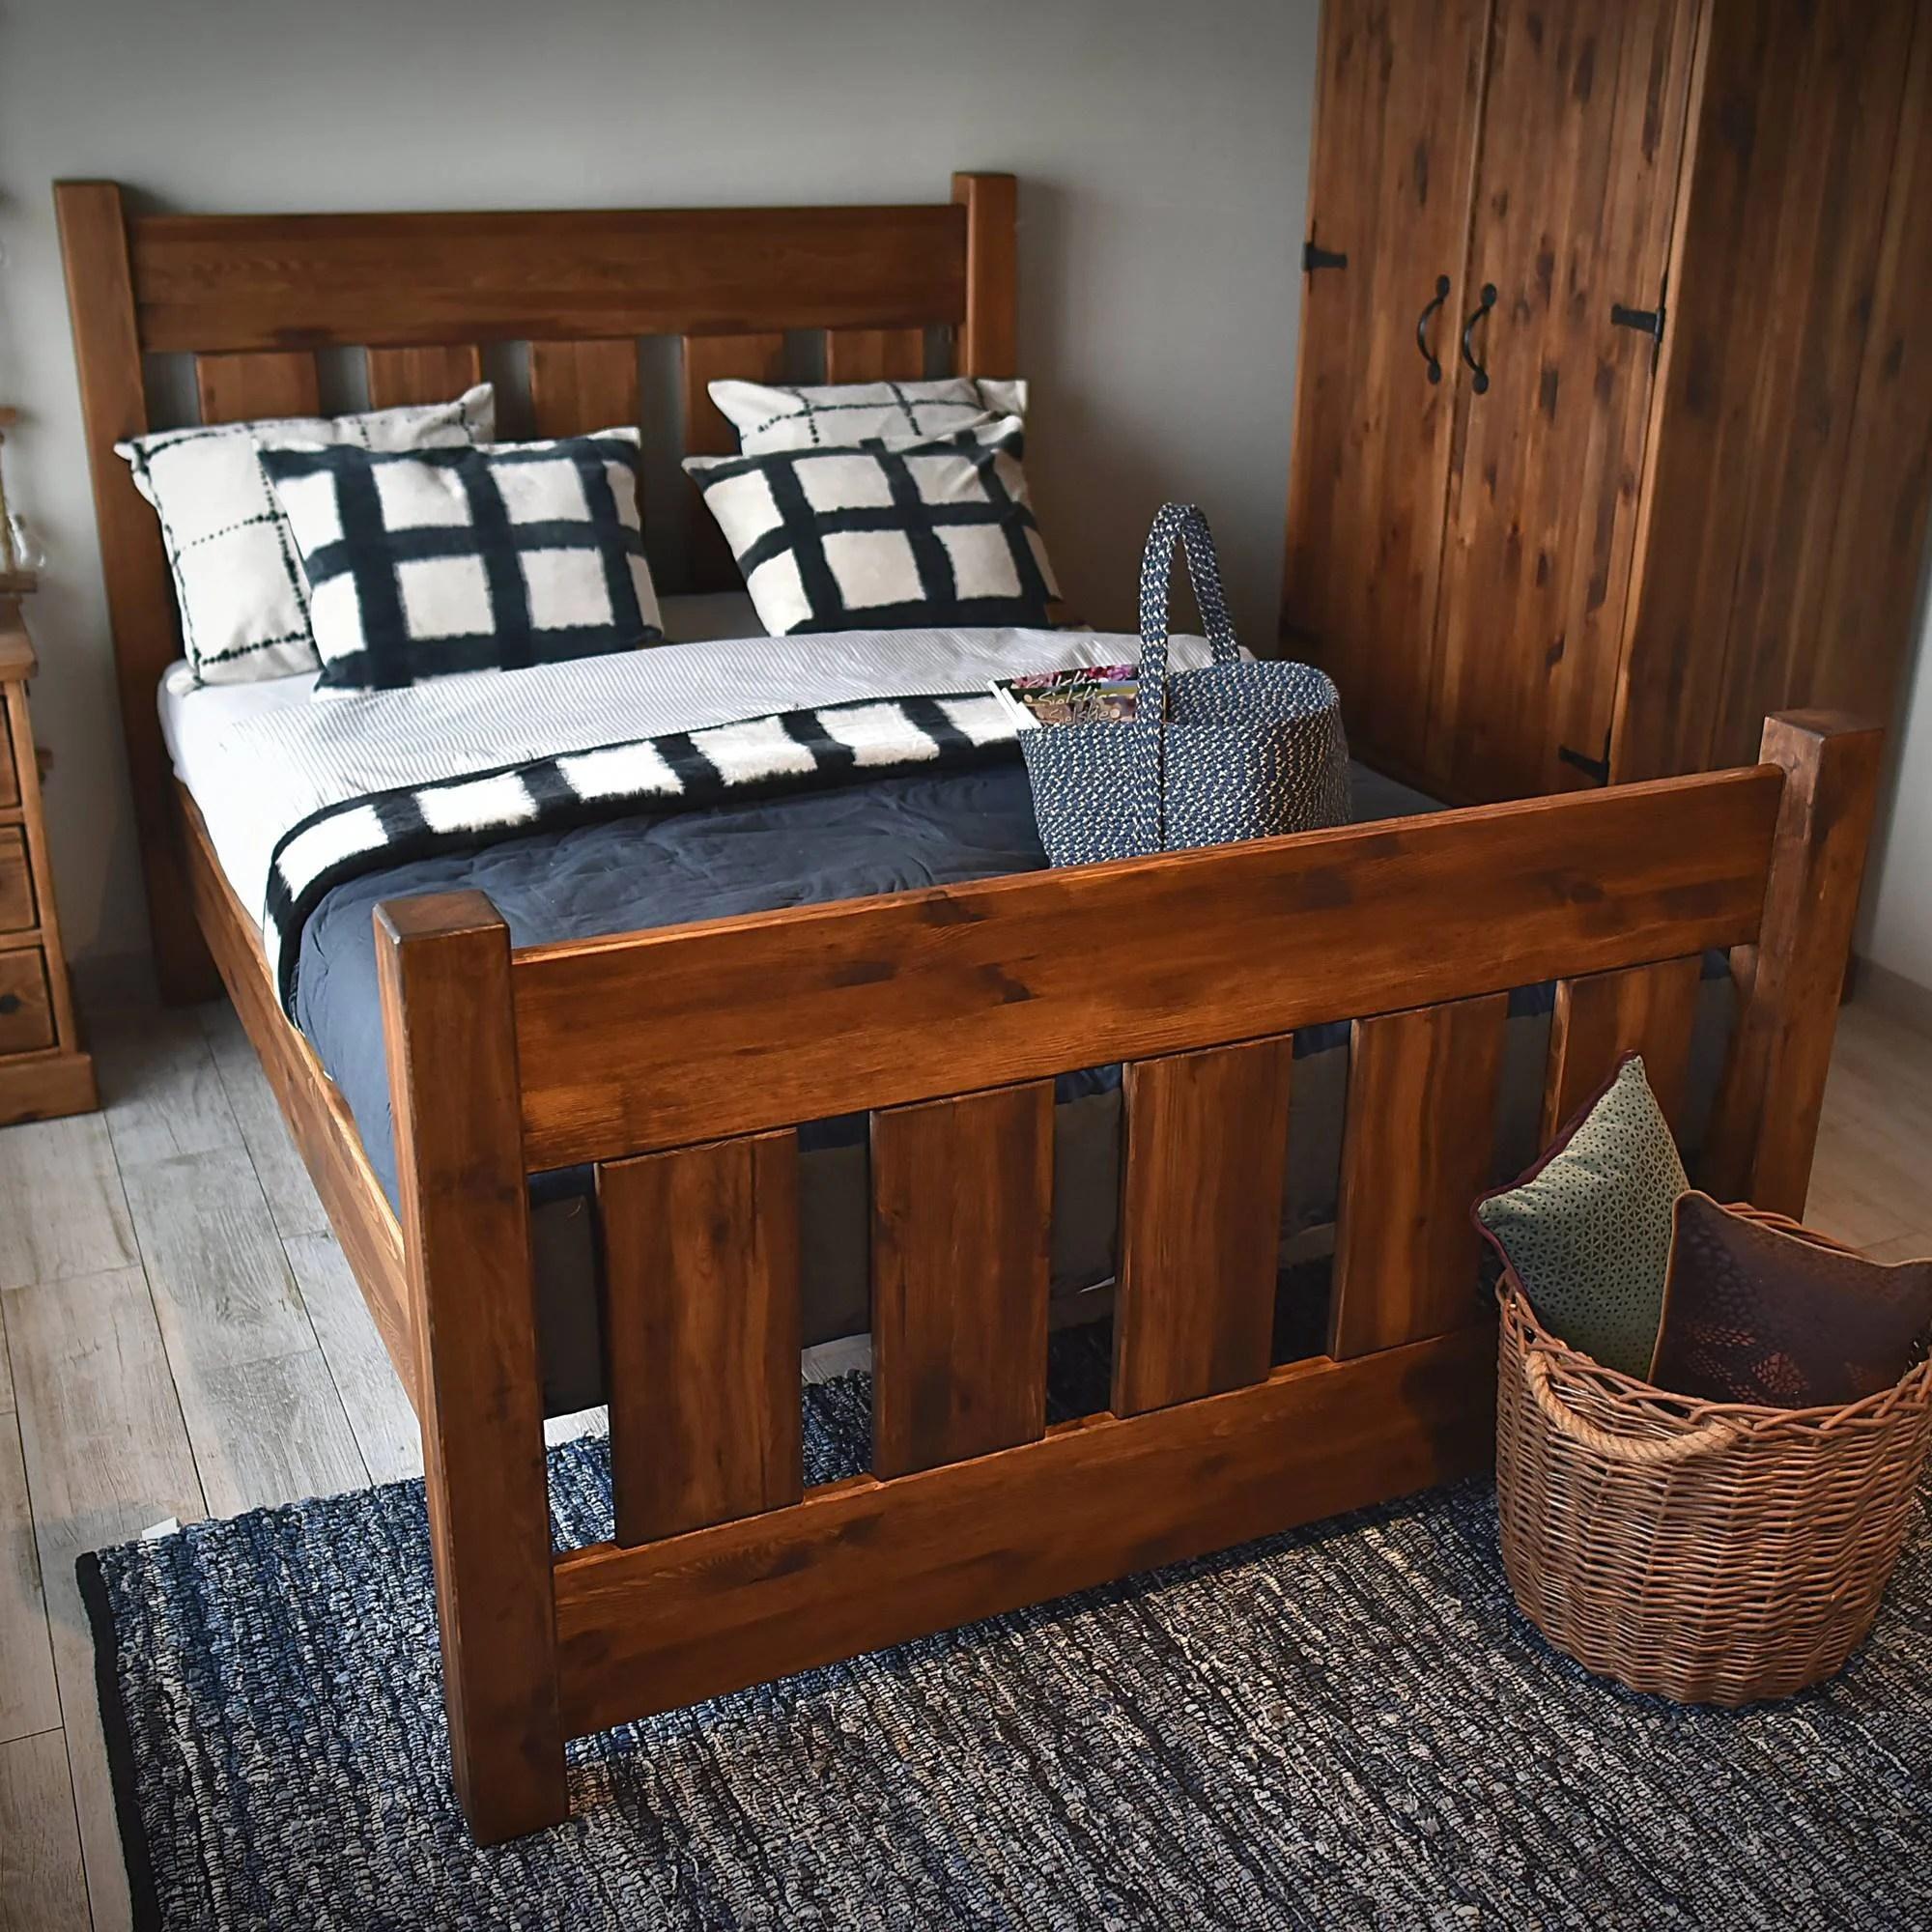 Massivholz Bett Rustikal Rustikale Betten Im Landhausstil Hier